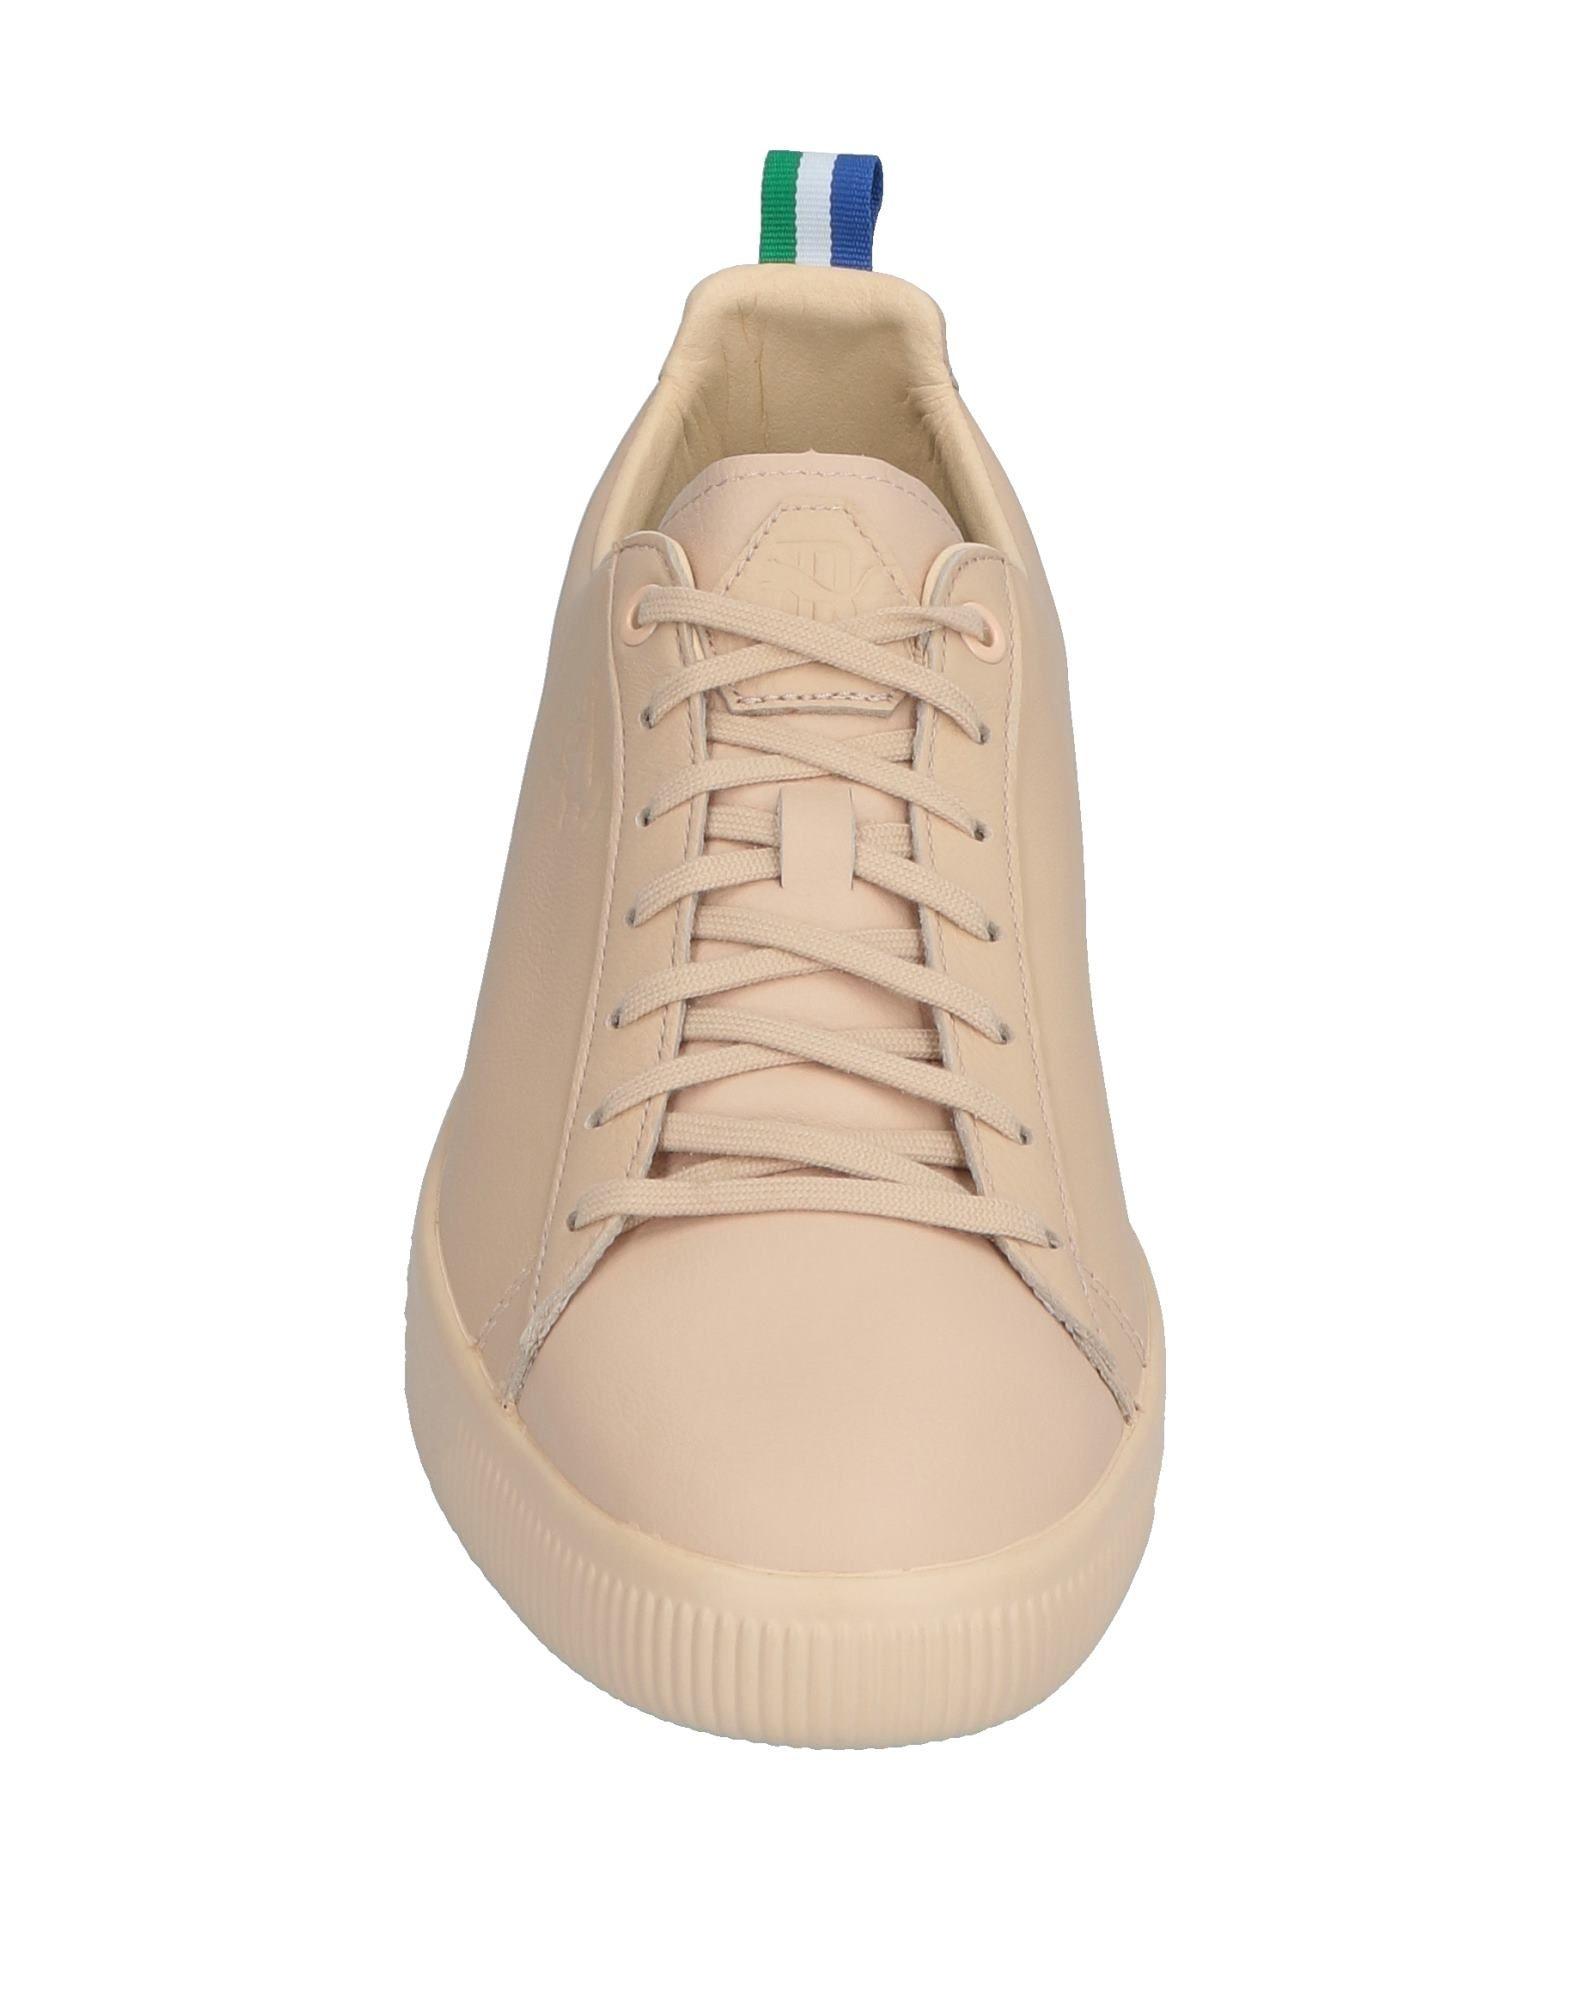 Rabatt echte Schuhe Puma Puma Puma X Big Sean Sneakers Herren  11559170UQ 1f5c8f